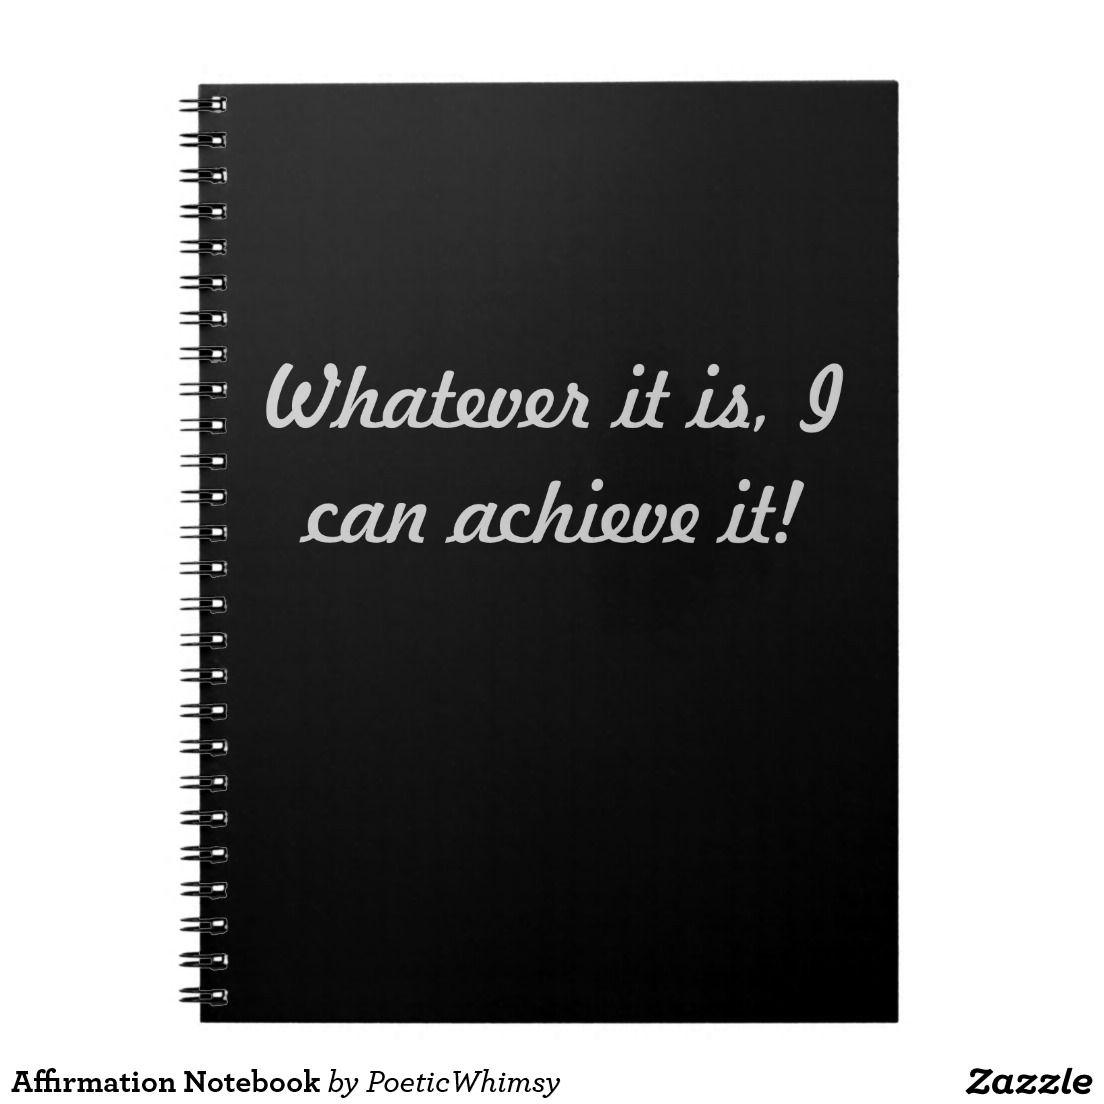 Affirmation Notebook